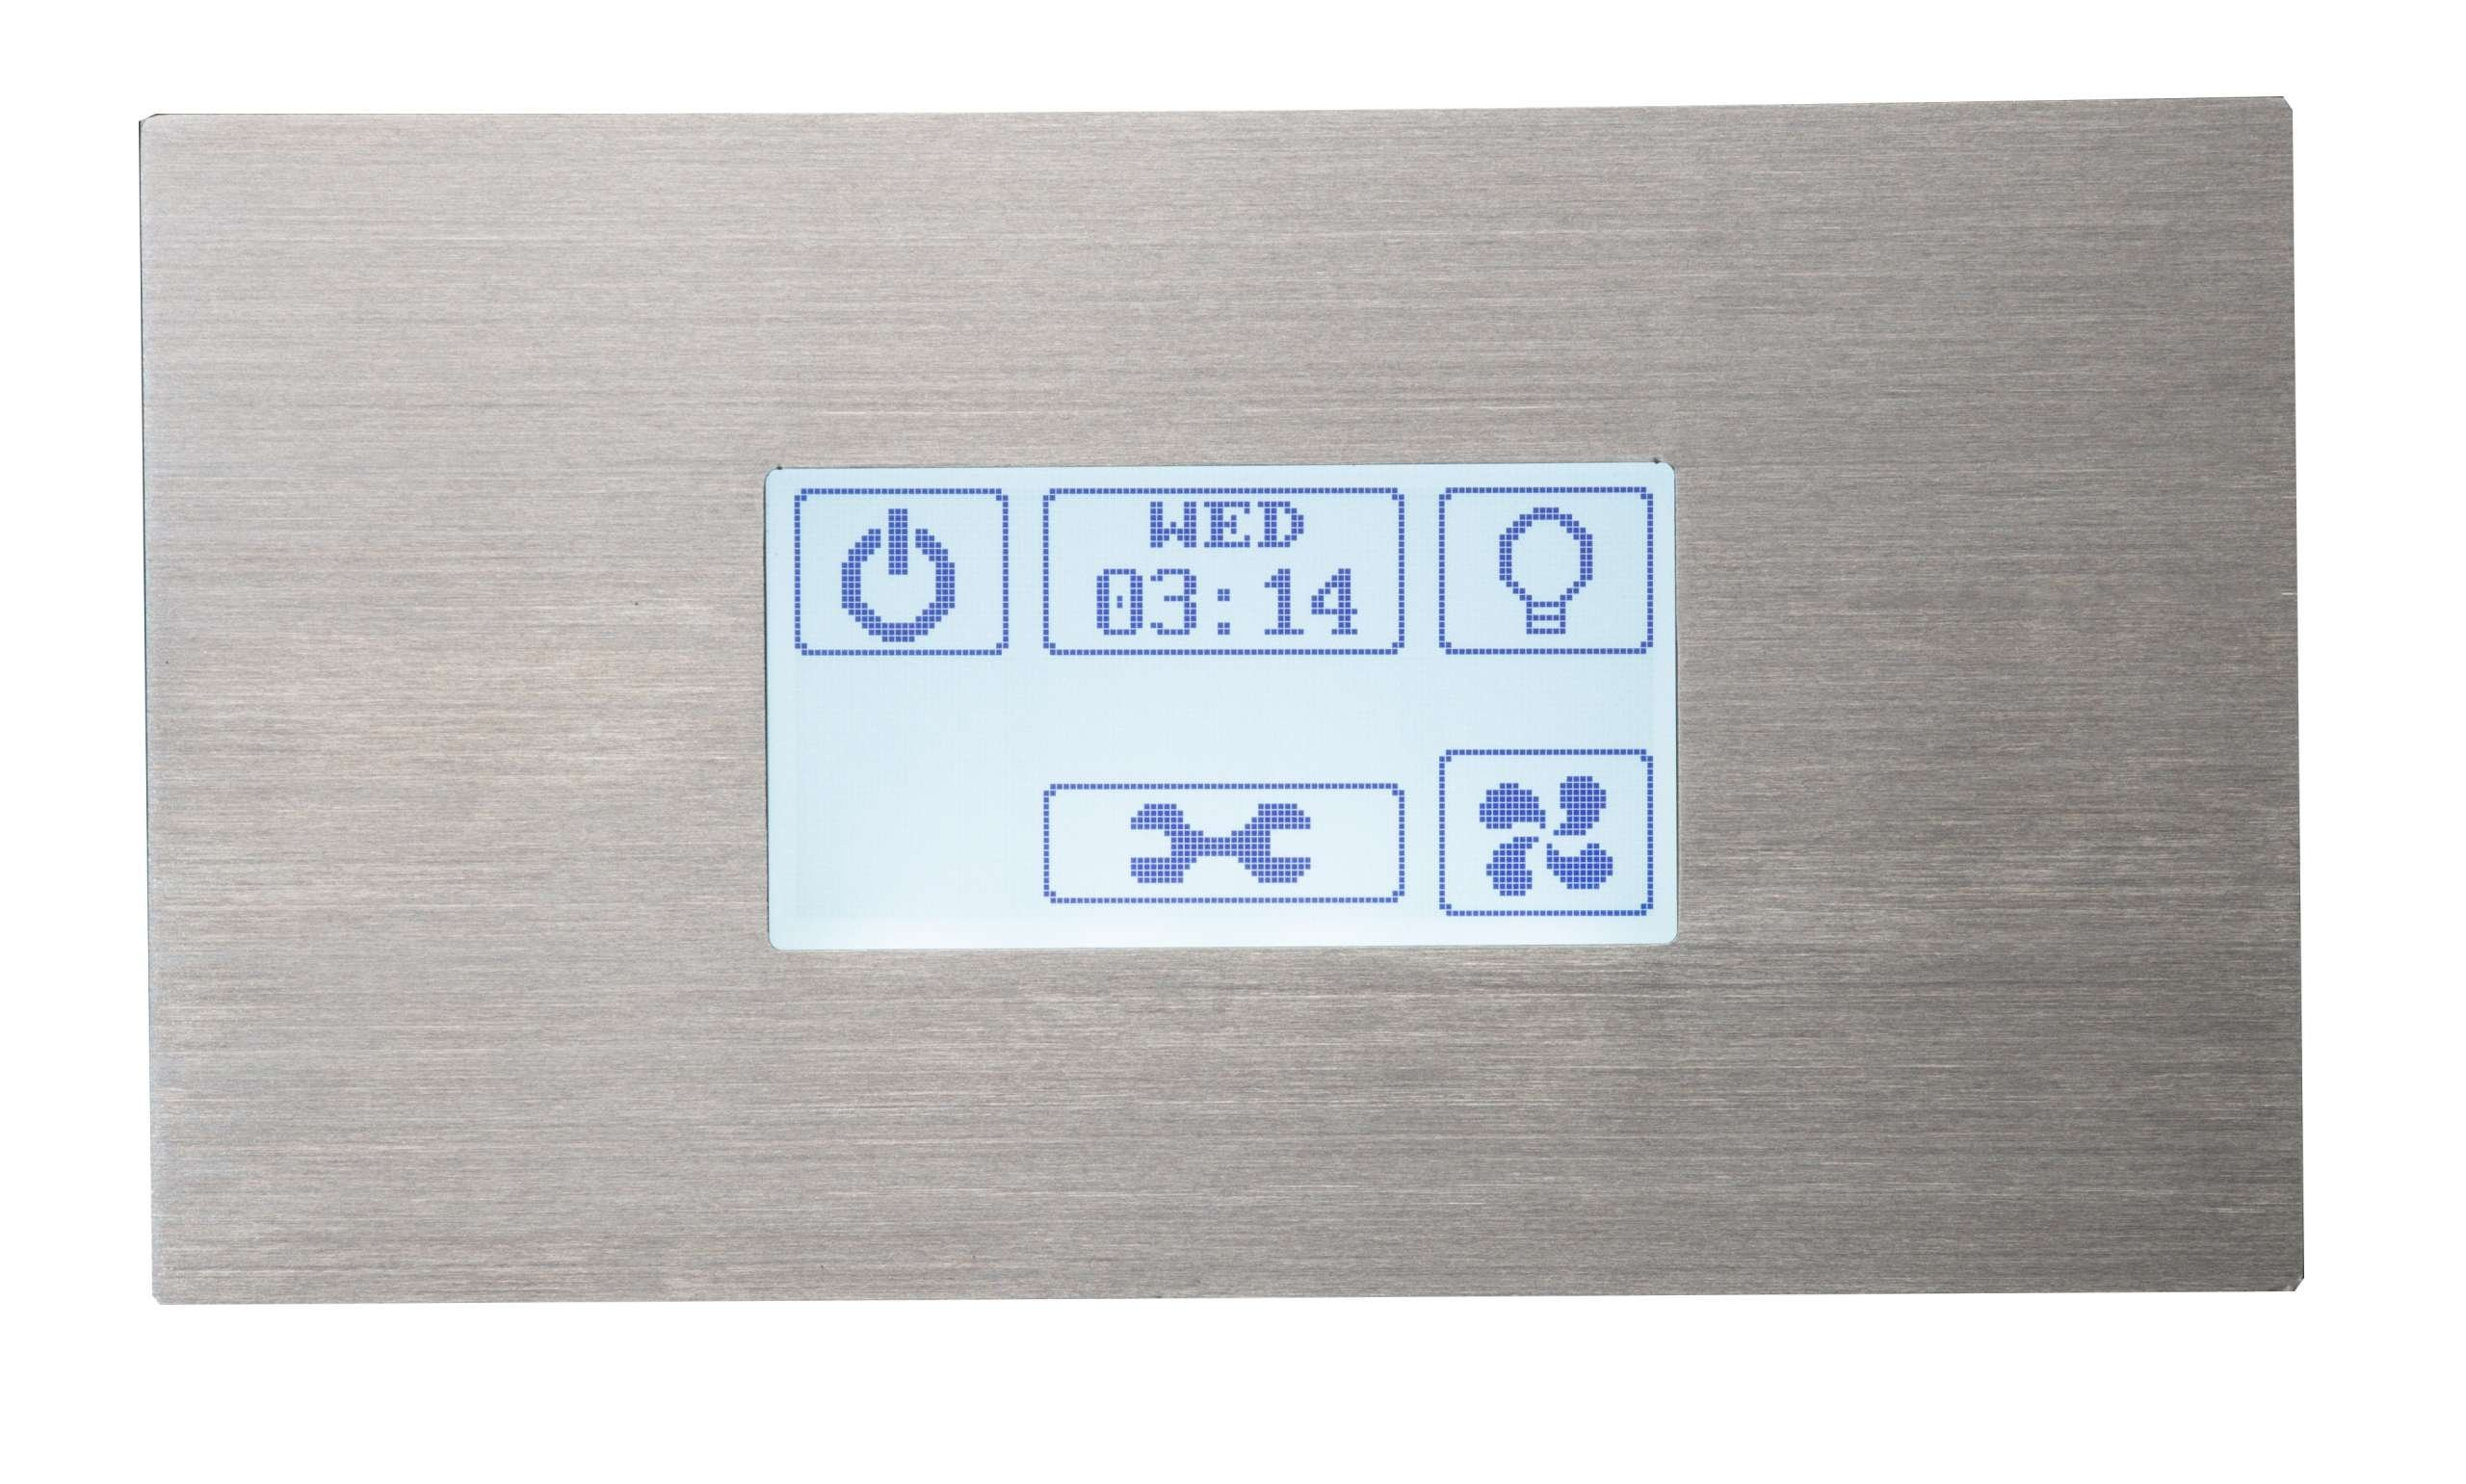 Afbeelding van Sawotec Touch STP bedieningspaneel voor stoomgenerator